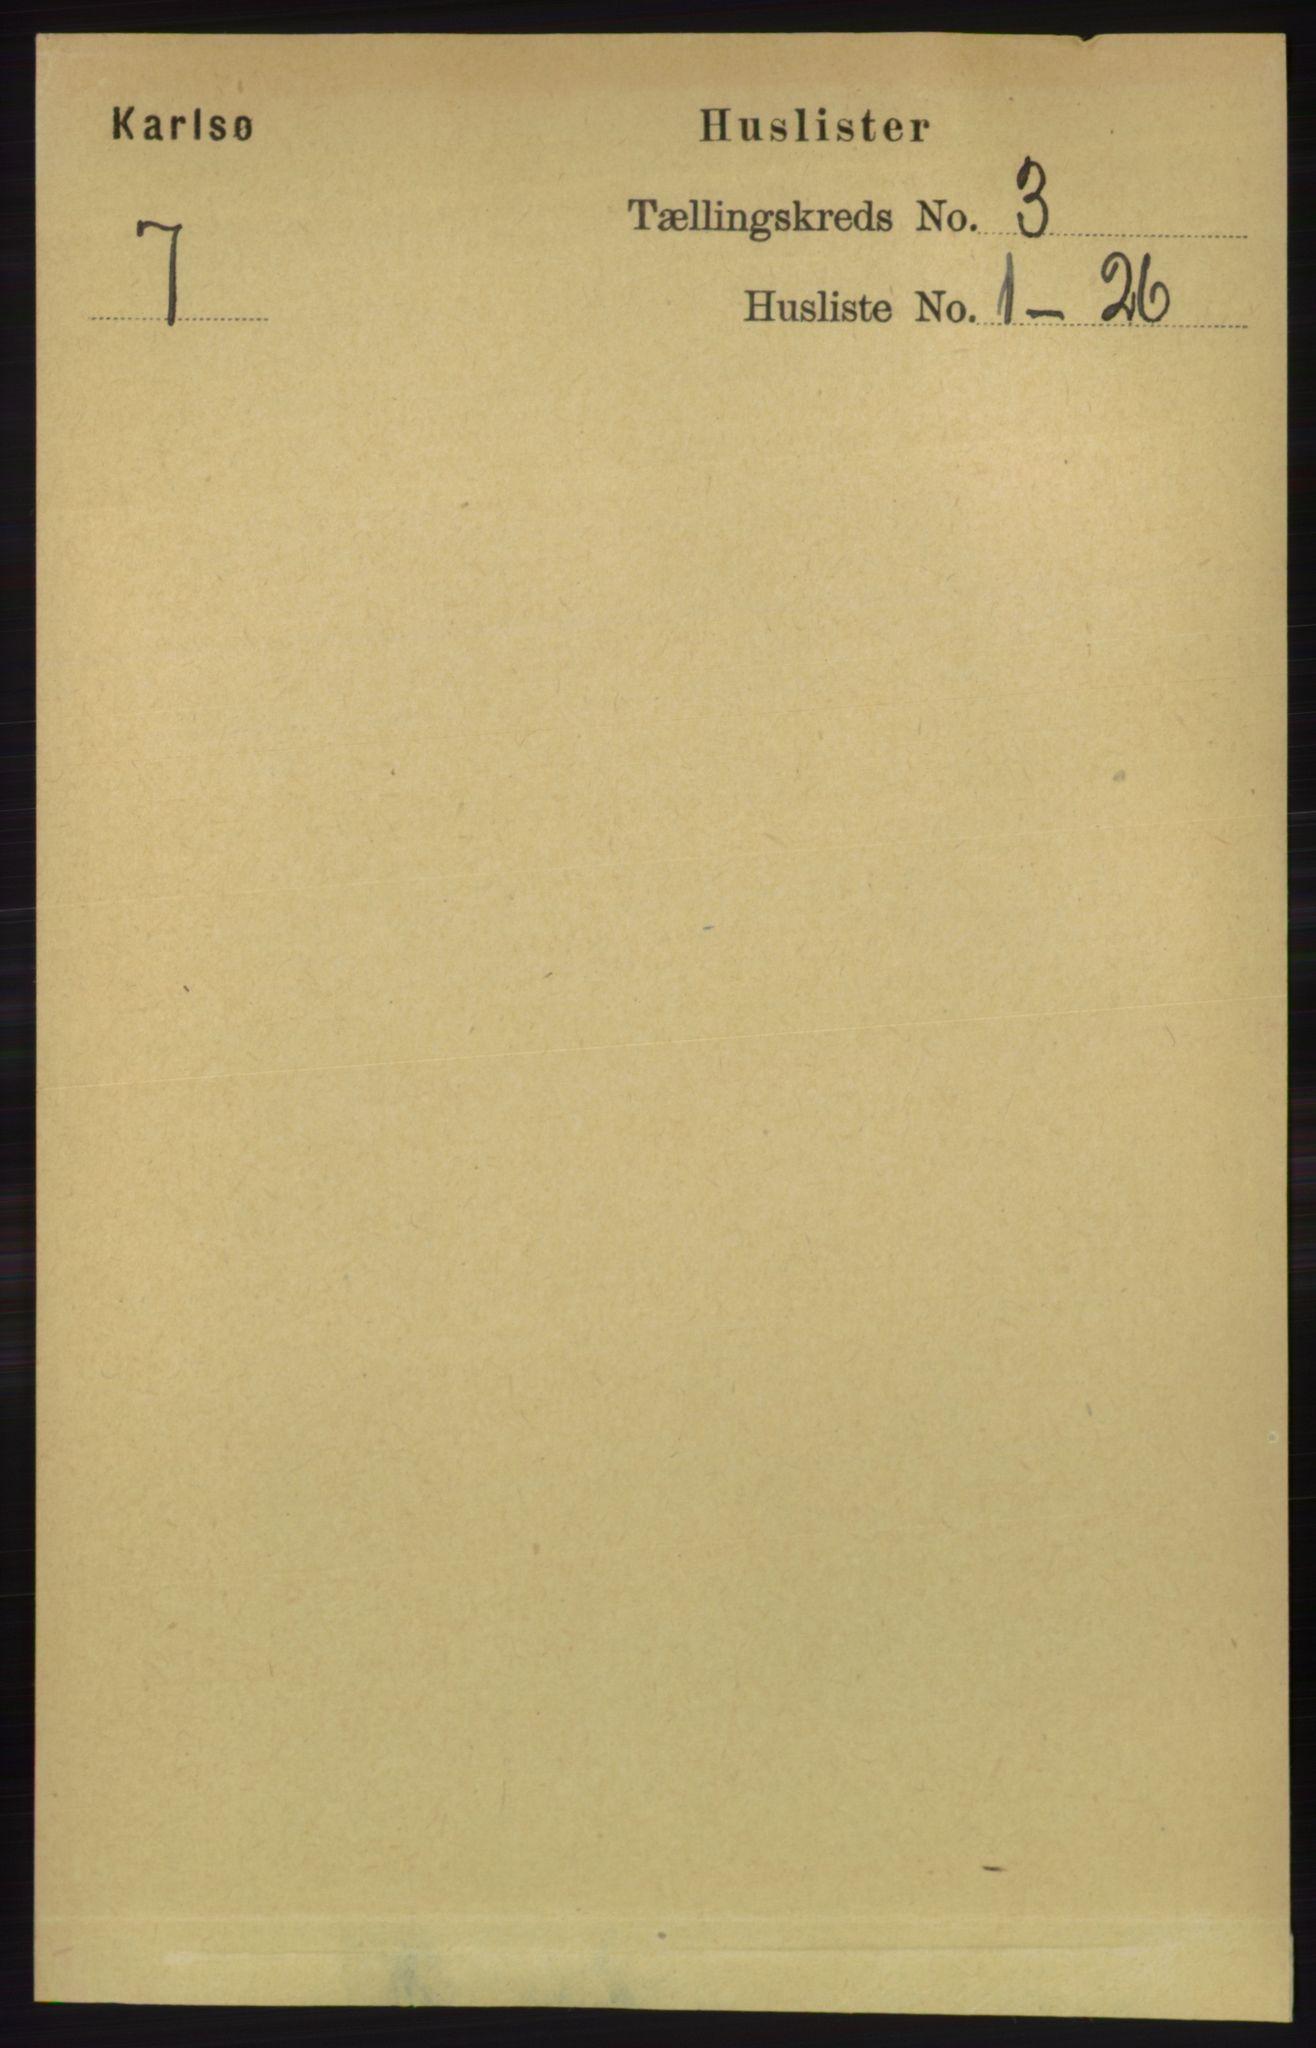 RA, Folketelling 1891 for 1936 Karlsøy herred, 1891, s. 579